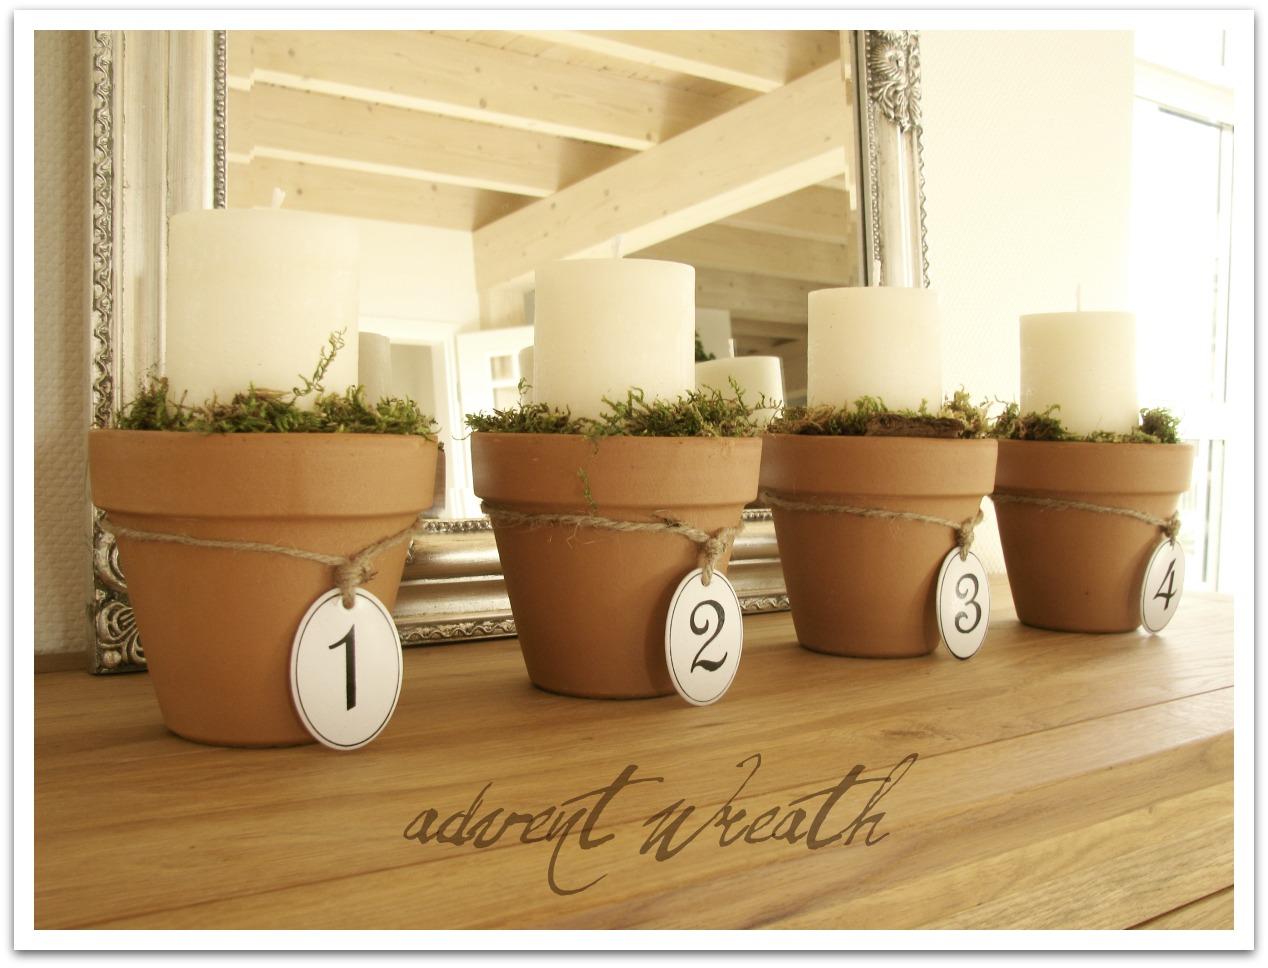 freudentanz advent wreath. Black Bedroom Furniture Sets. Home Design Ideas